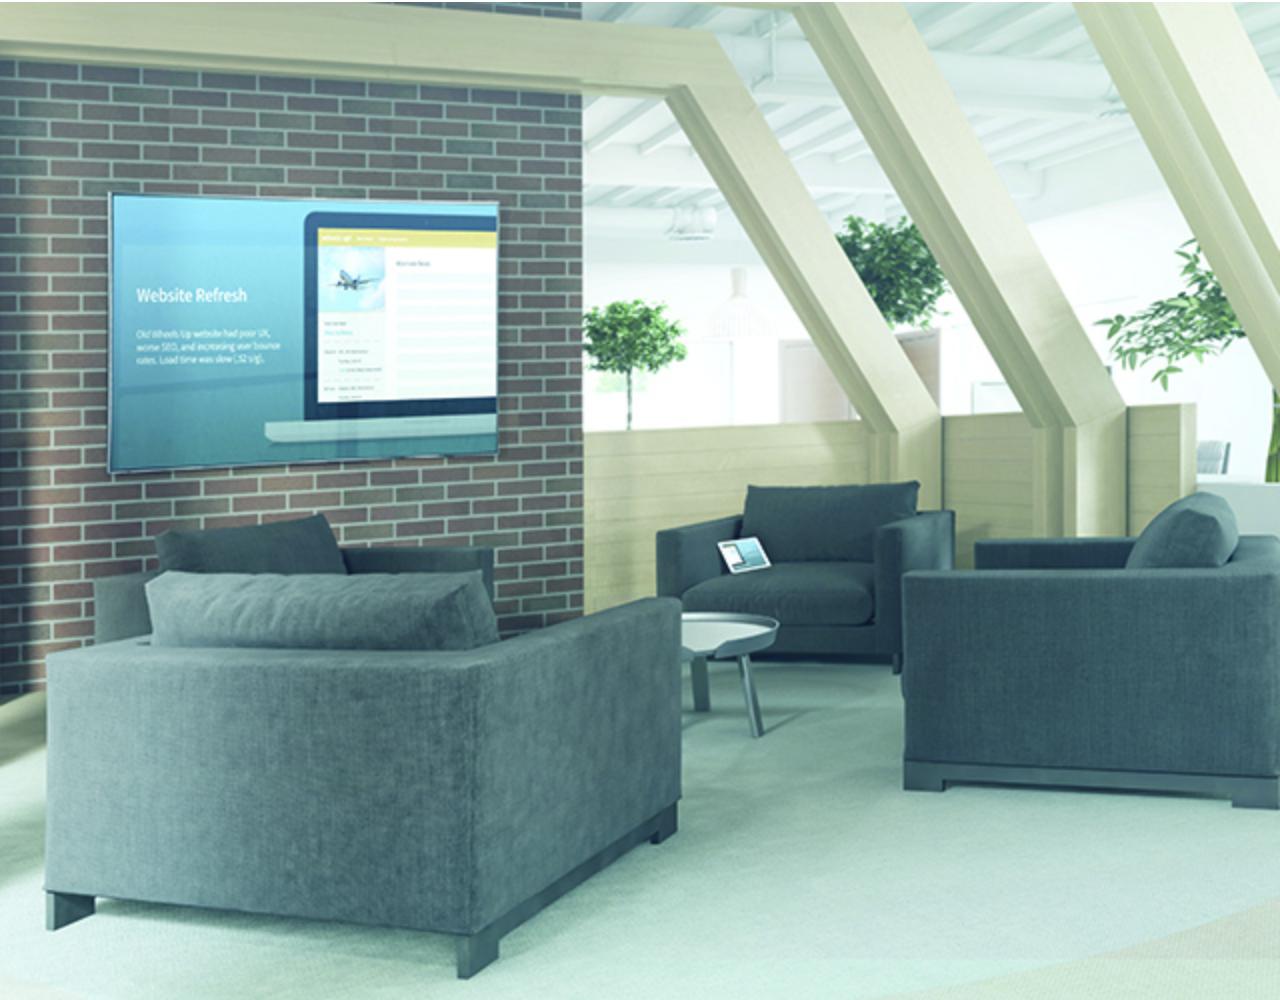 Open presentation space